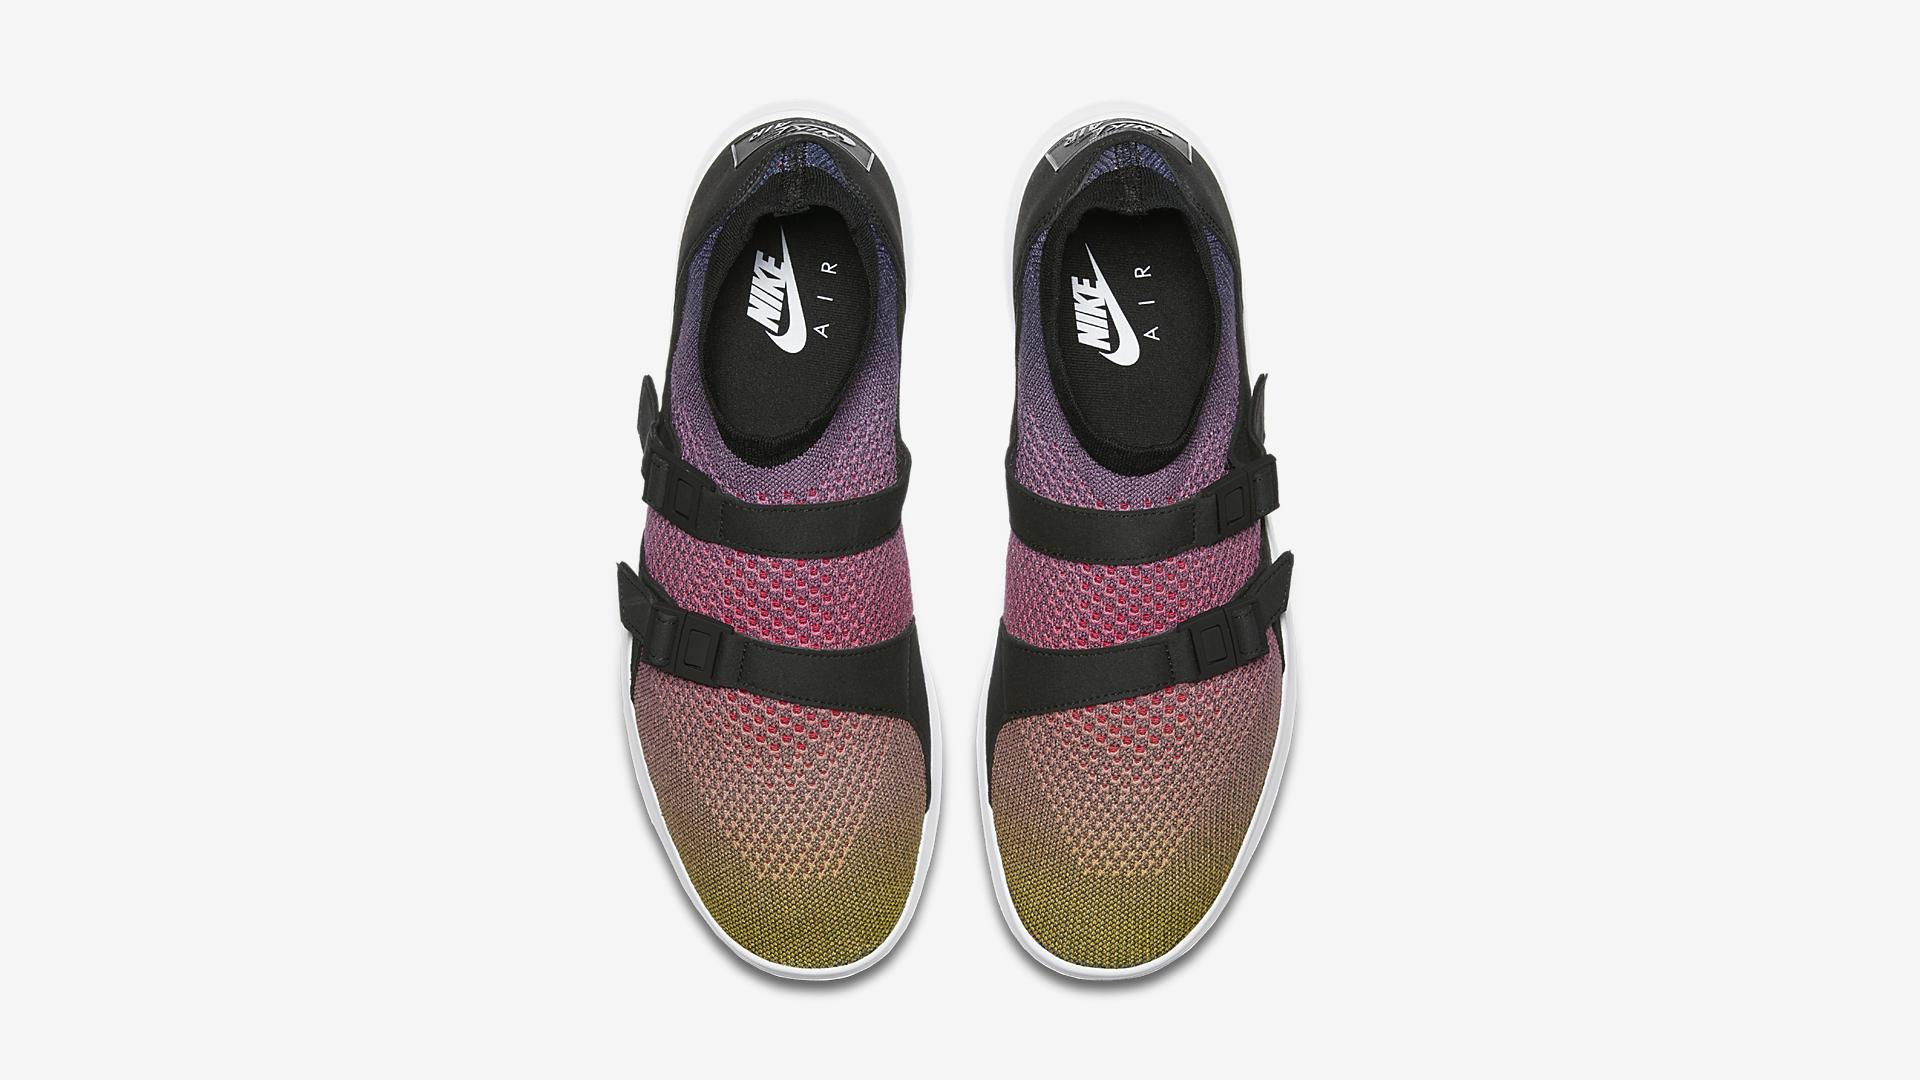 Nike Air Sock Racer Ultra Flyknit Premium Rainbow 898021 700 3